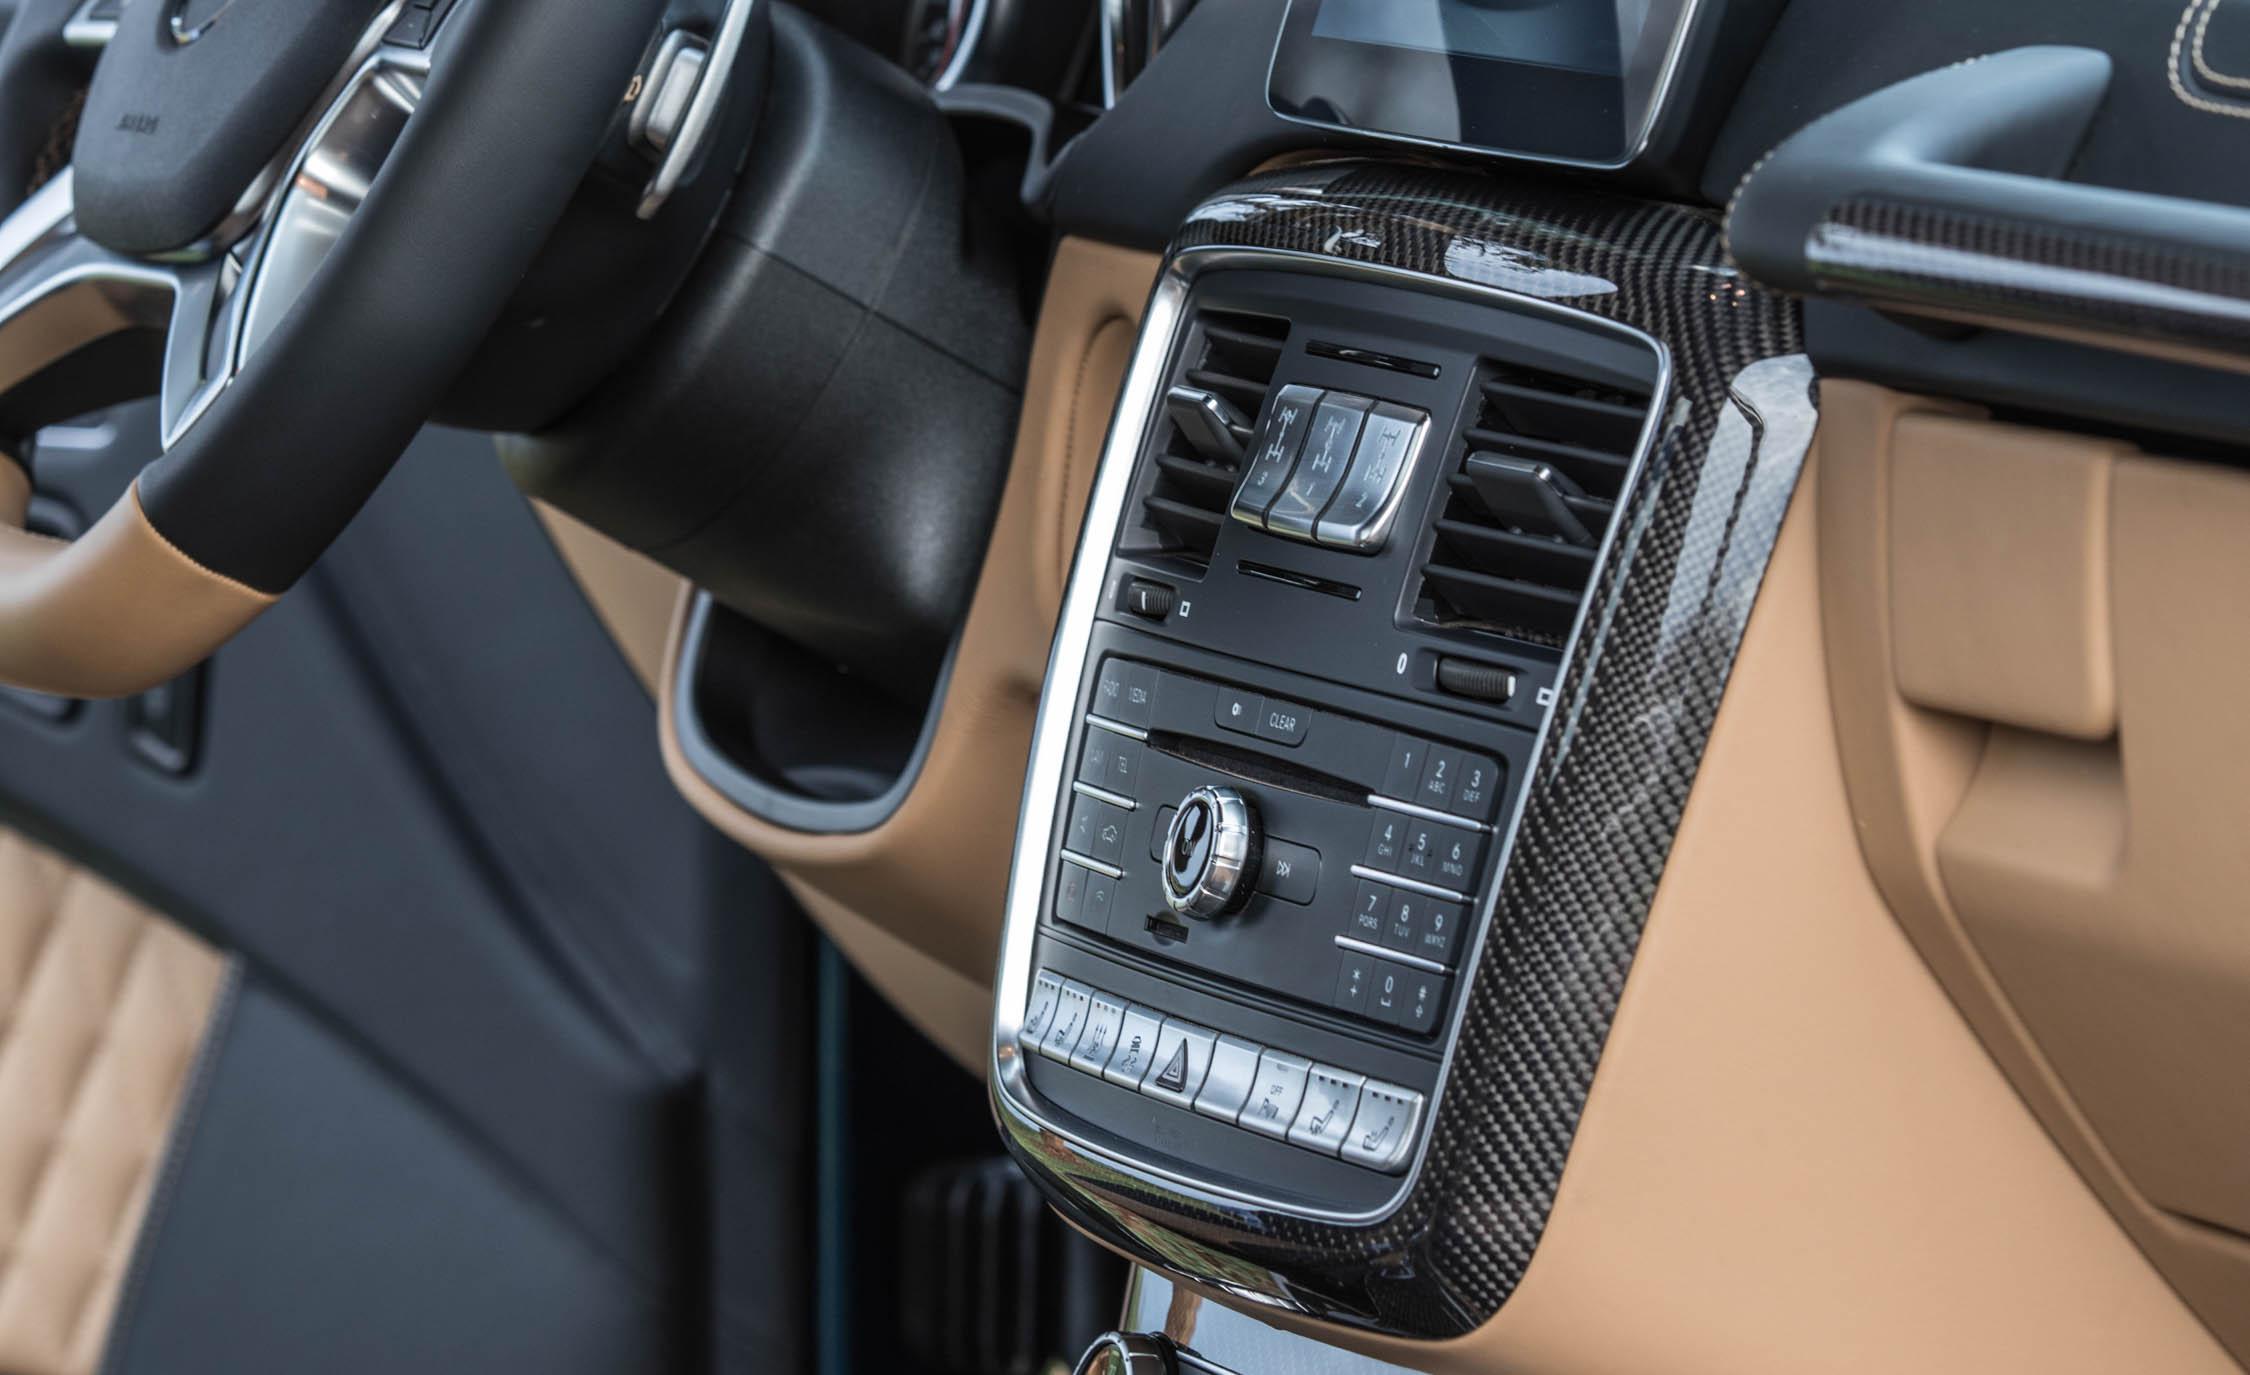 https://cevpu.com/wp-content/uploads/2017/02/2018-Mercedes-Maybach-G650-Landaulet-interior-front-dashboard-panels.jpg